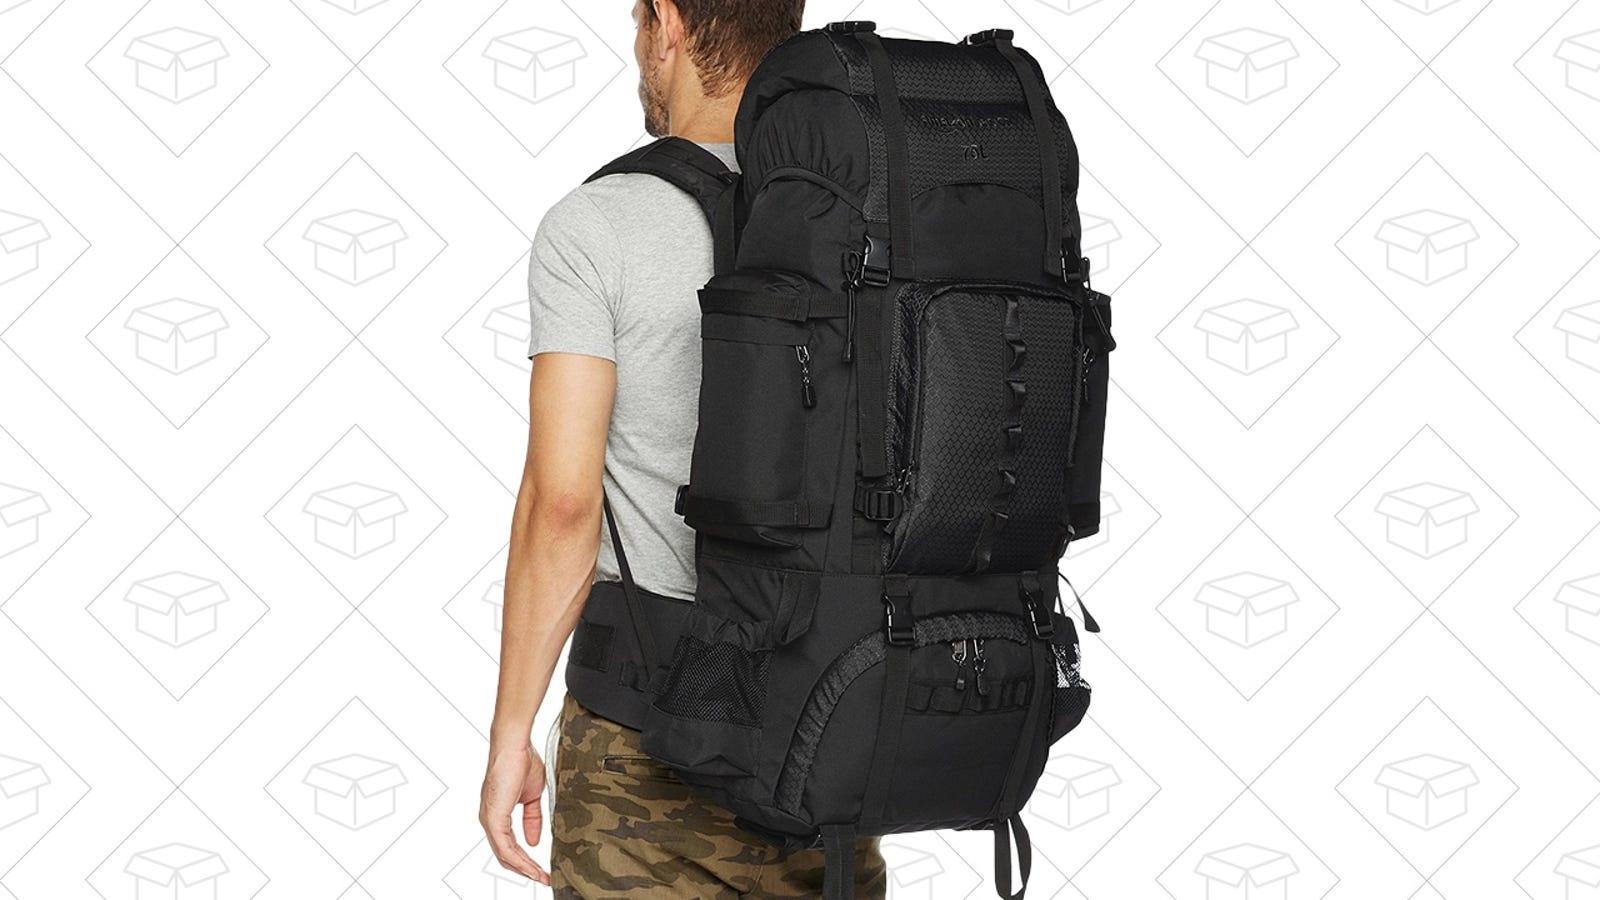 ae3b1084d4 Amazonbasics Internal Frame Hiking Backpack With Rainfly